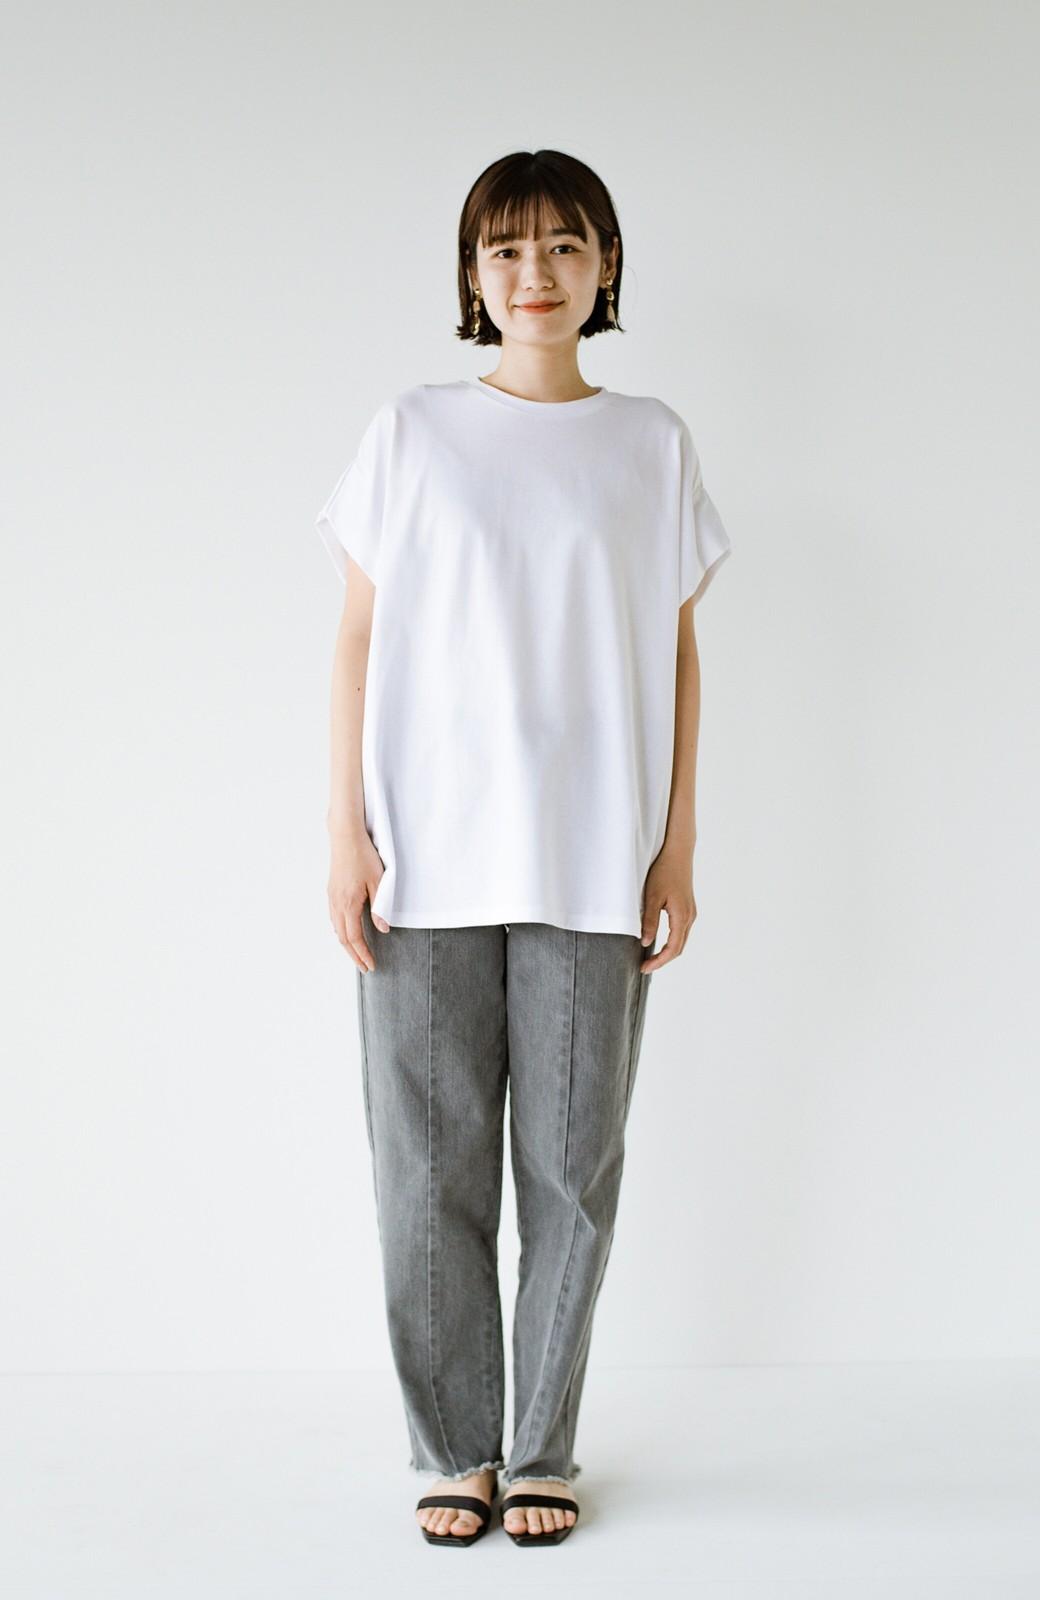 haco! PBPオーガニックコットン 楽ちんなのにブラウス気分で着られる大人のおめかしTシャツ <ホワイト>の商品写真8